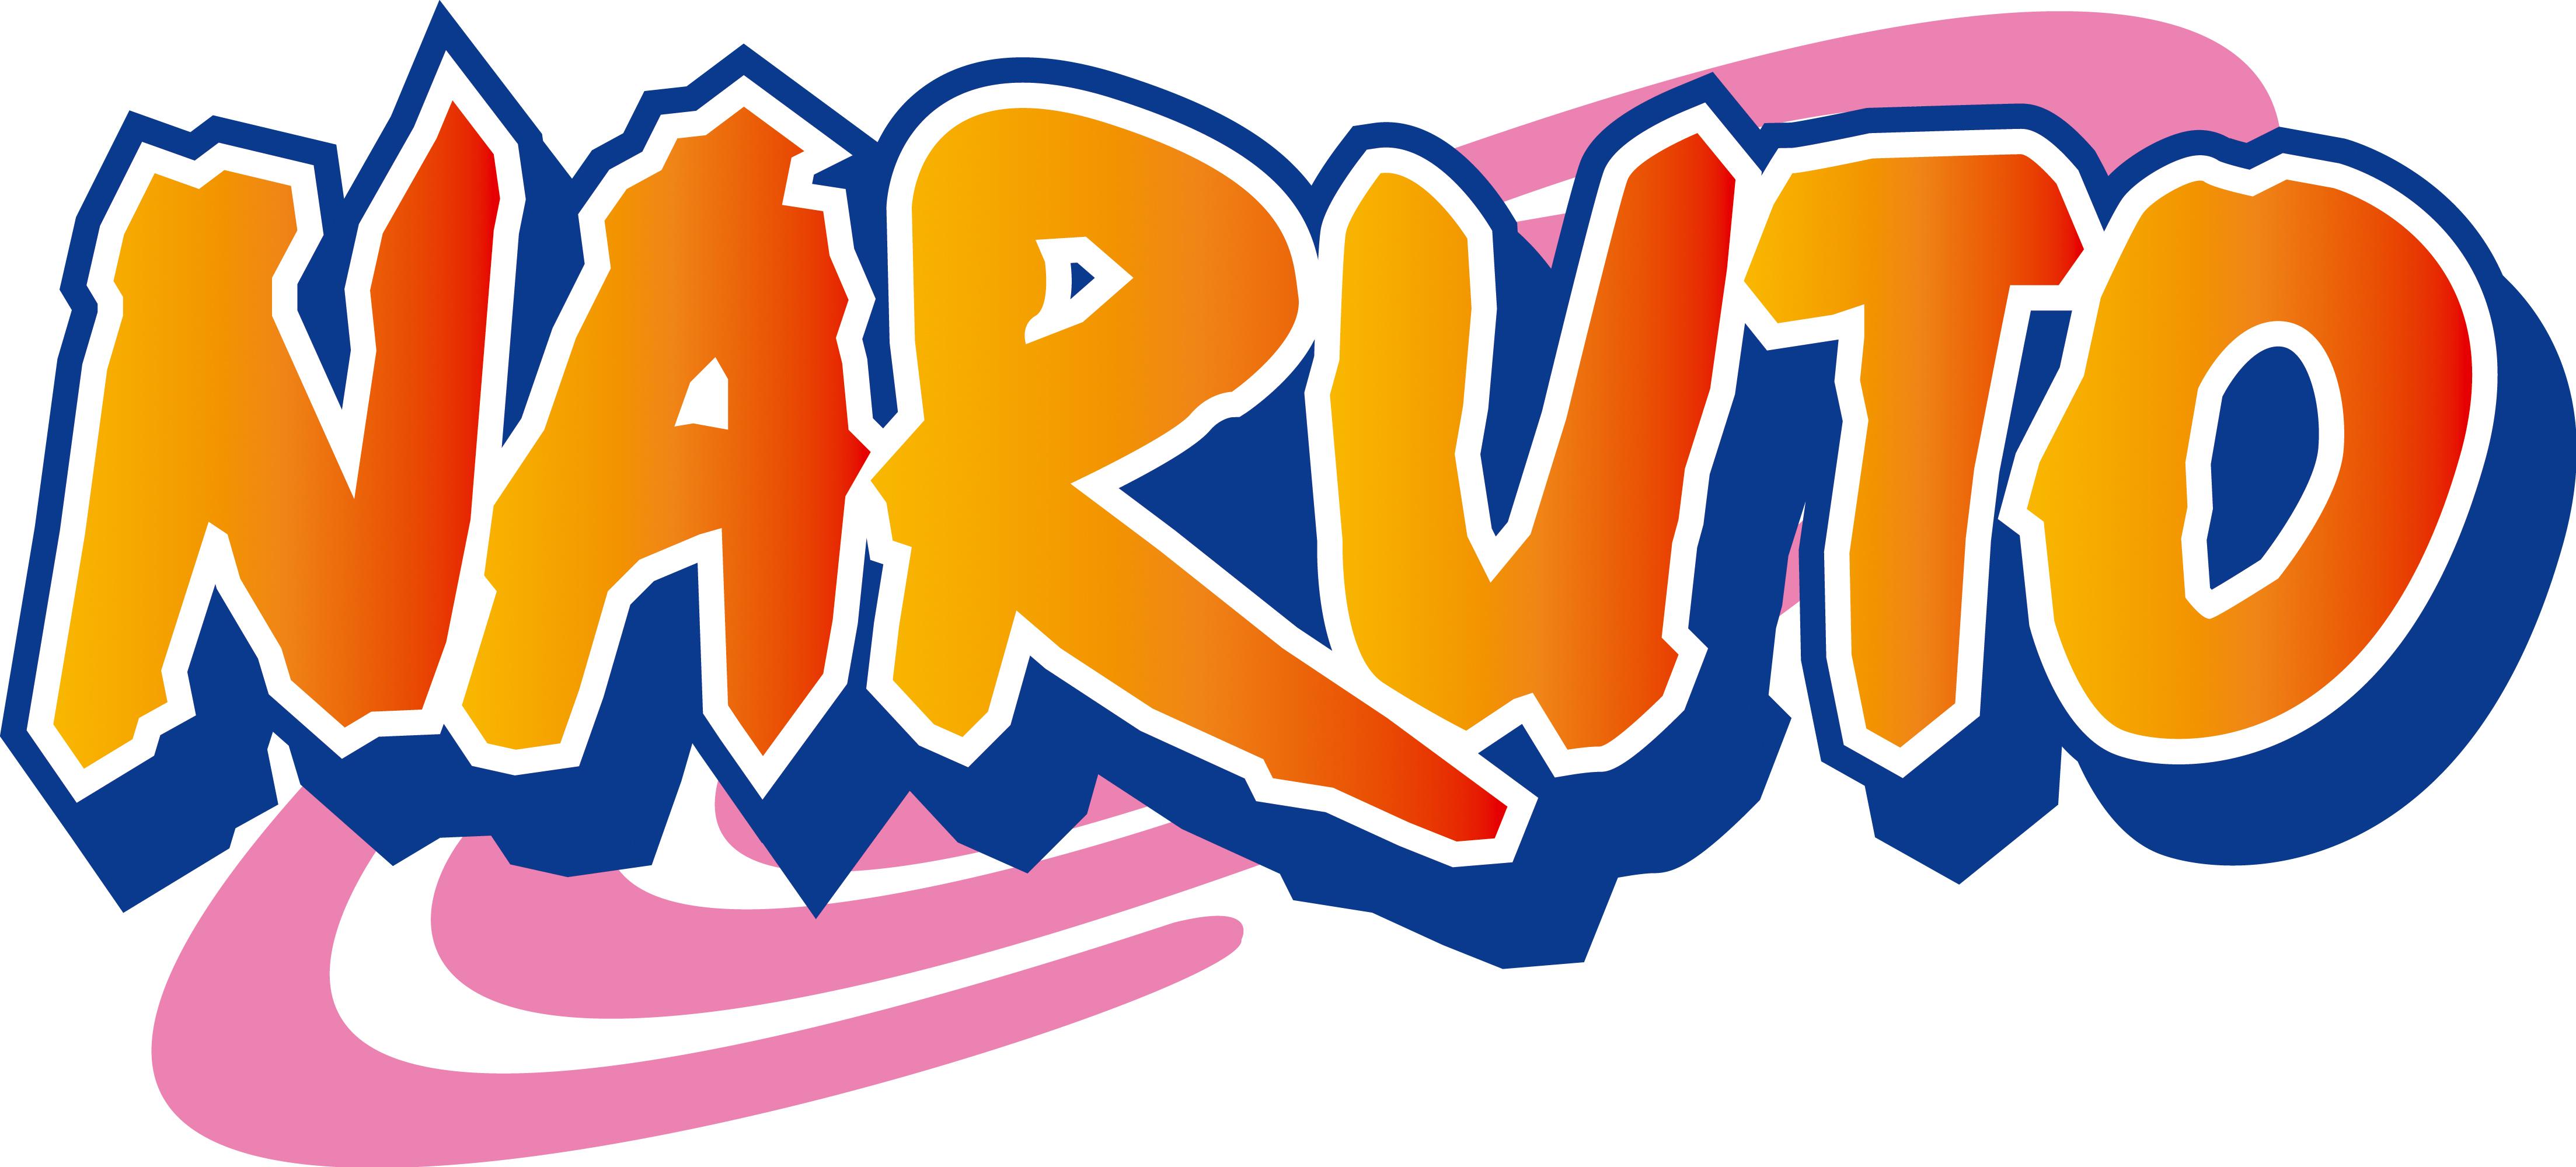 Naruto logo Wallpaper